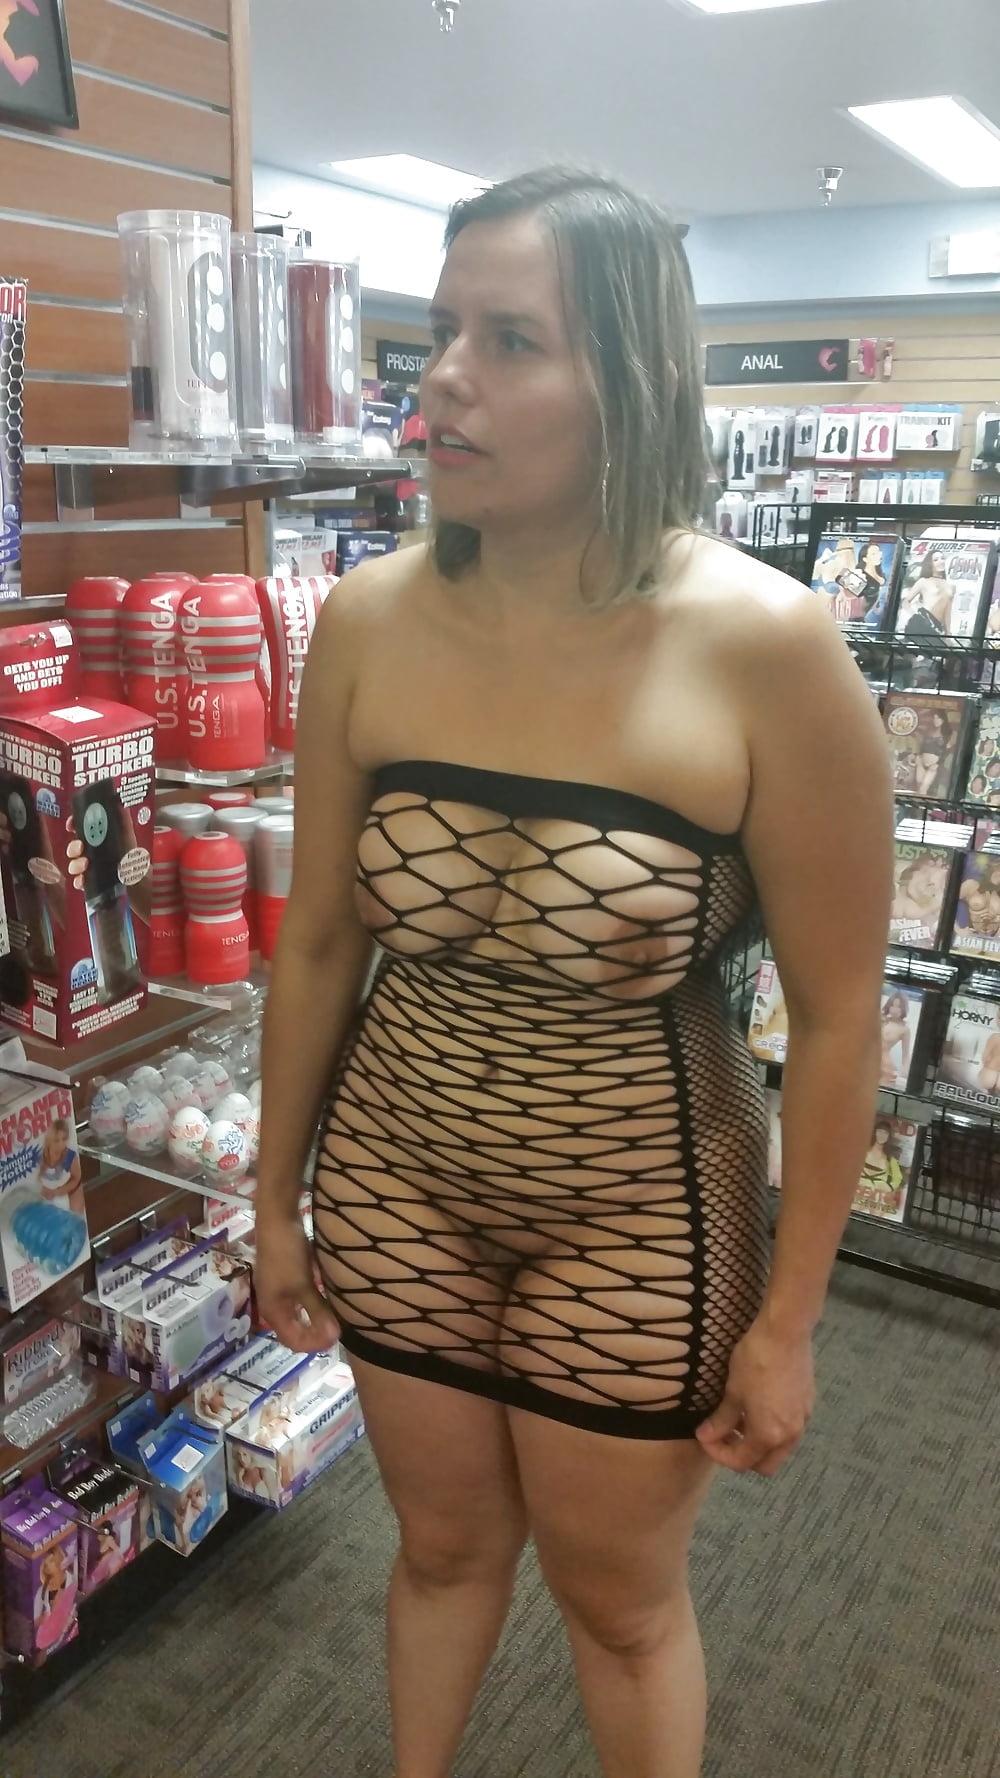 Finest Walmart Nude Images